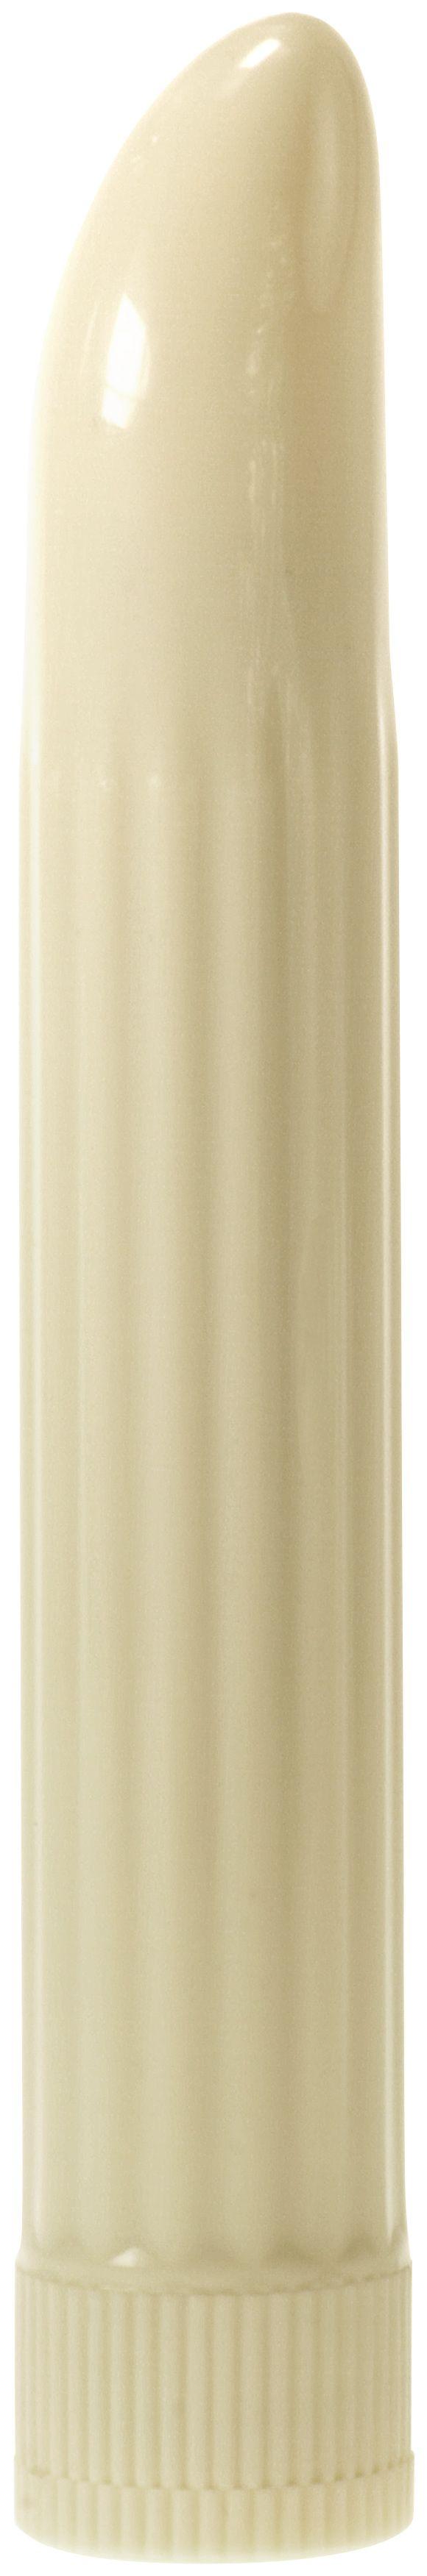 Sensuous Ribbed Vibrator Ivory Minx